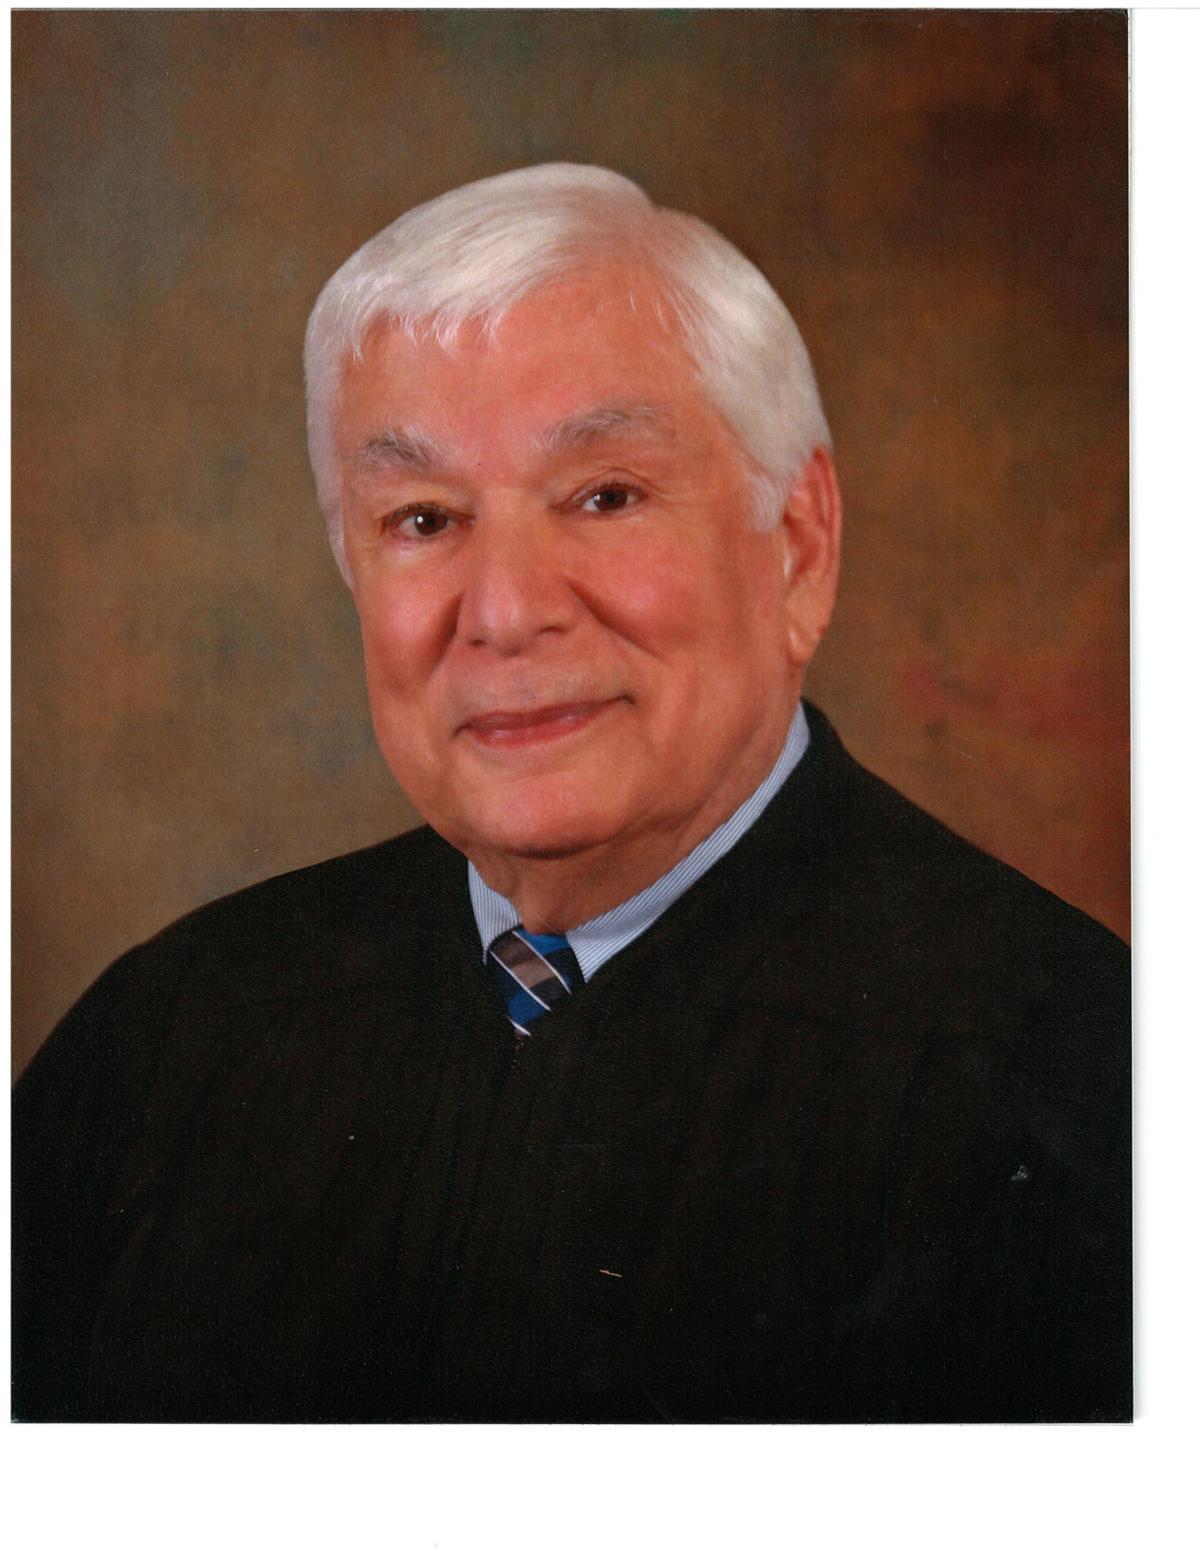 judge graphia